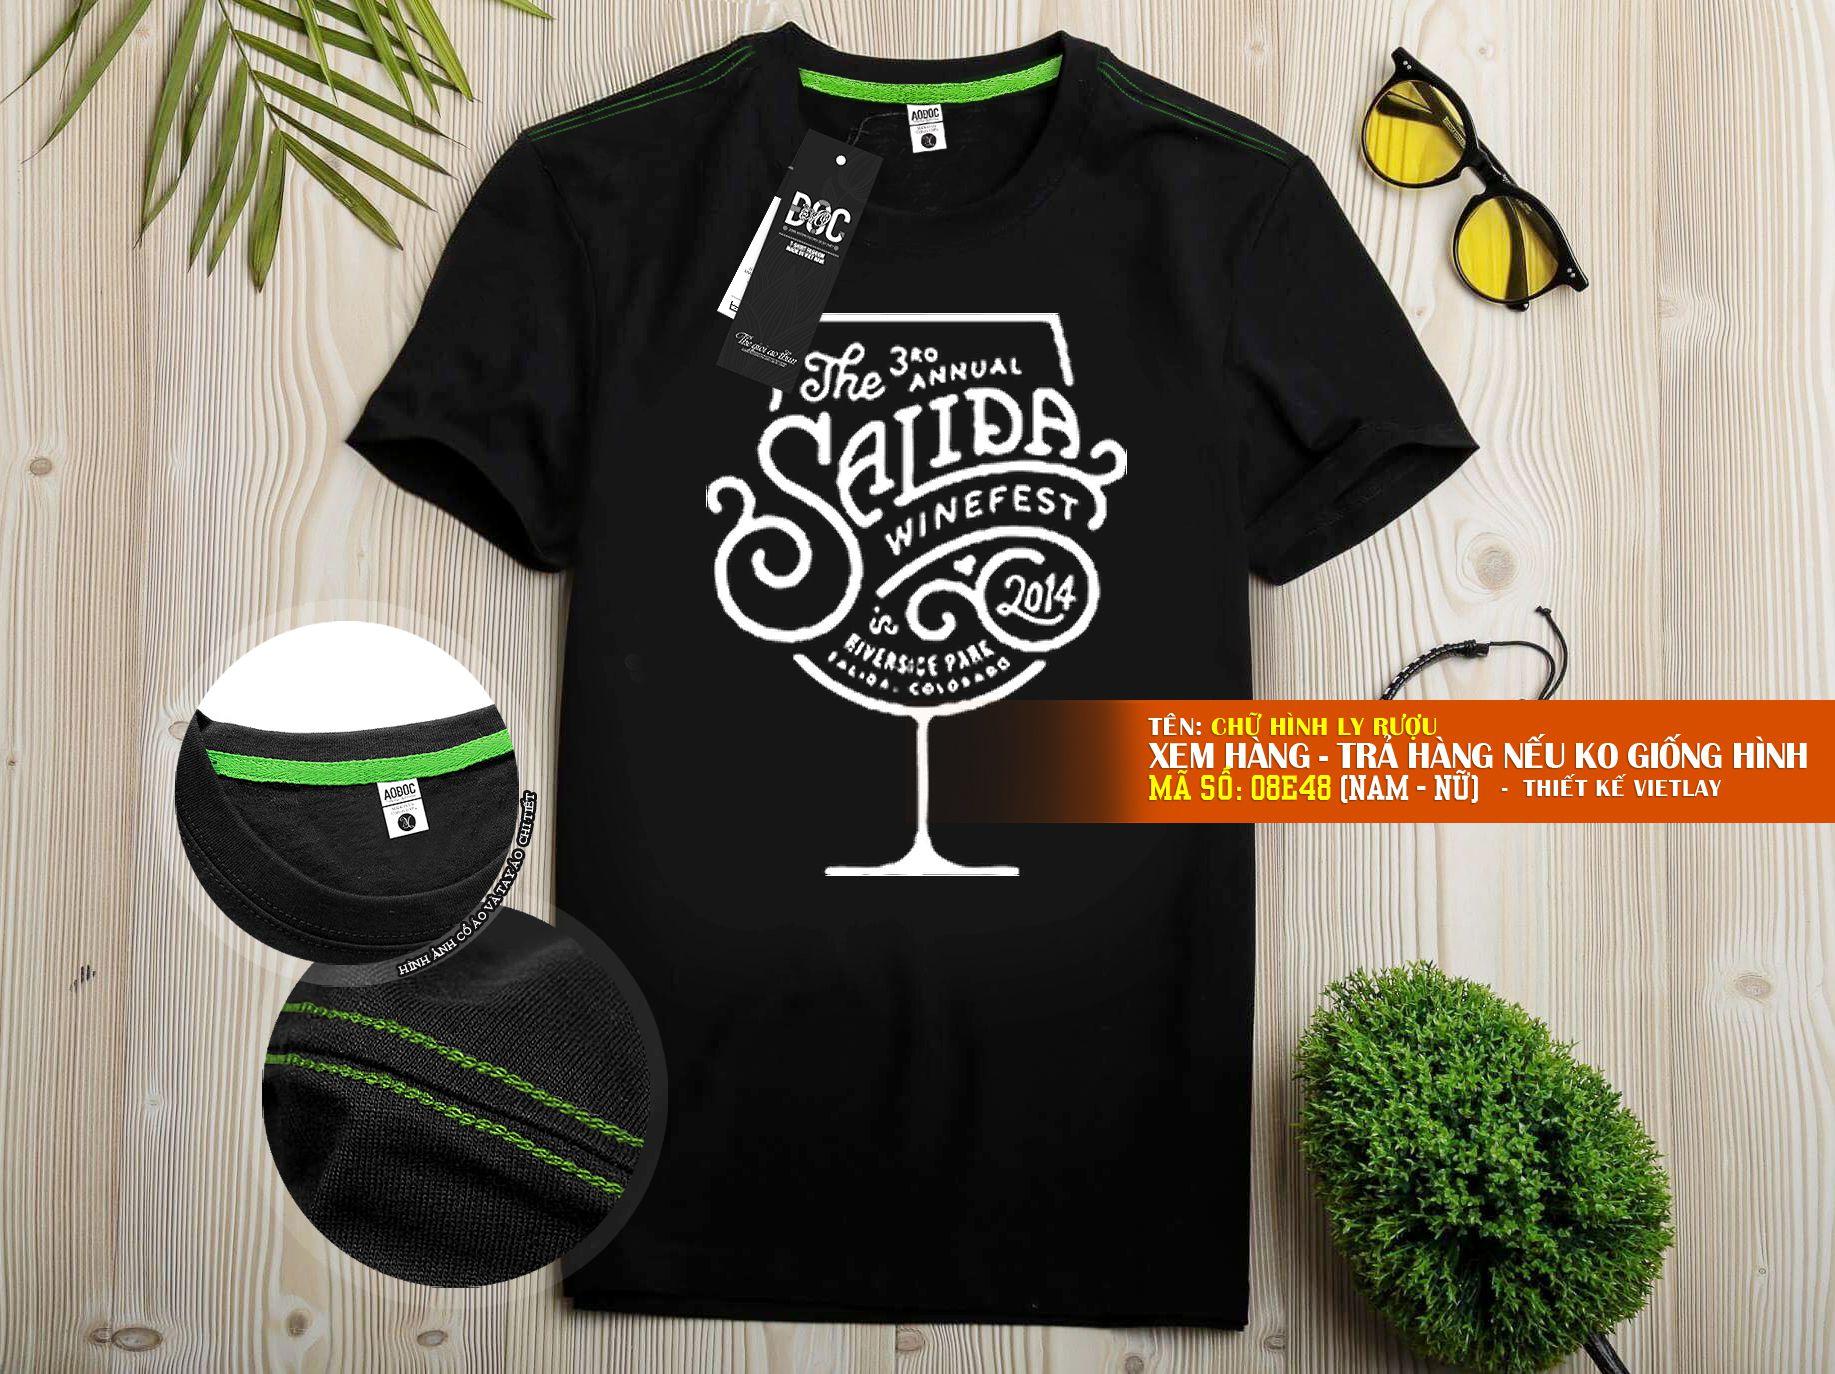 08E48 Ly Rượu Salida